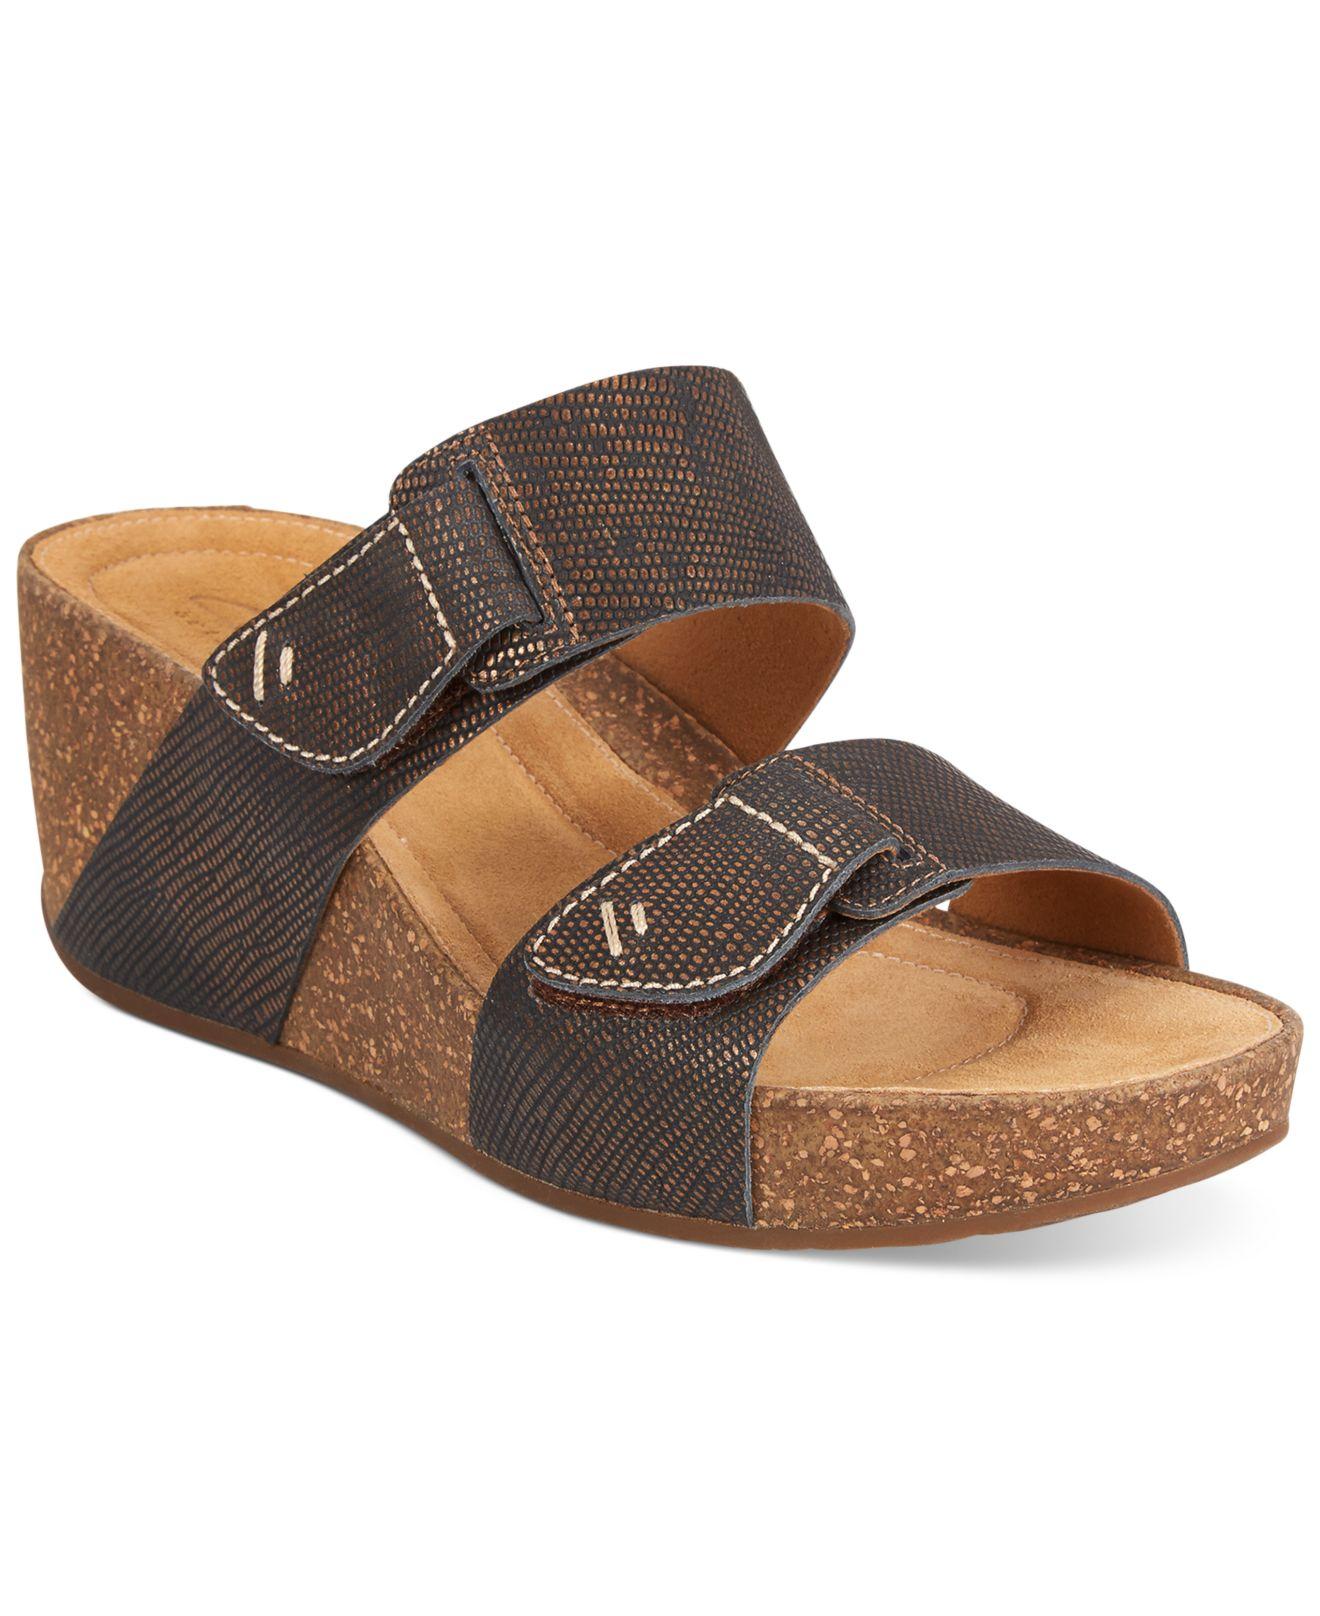 4210286356452 Lyst - Clarks Artisan Women S Temira East Platform Wedge Sandals in ...